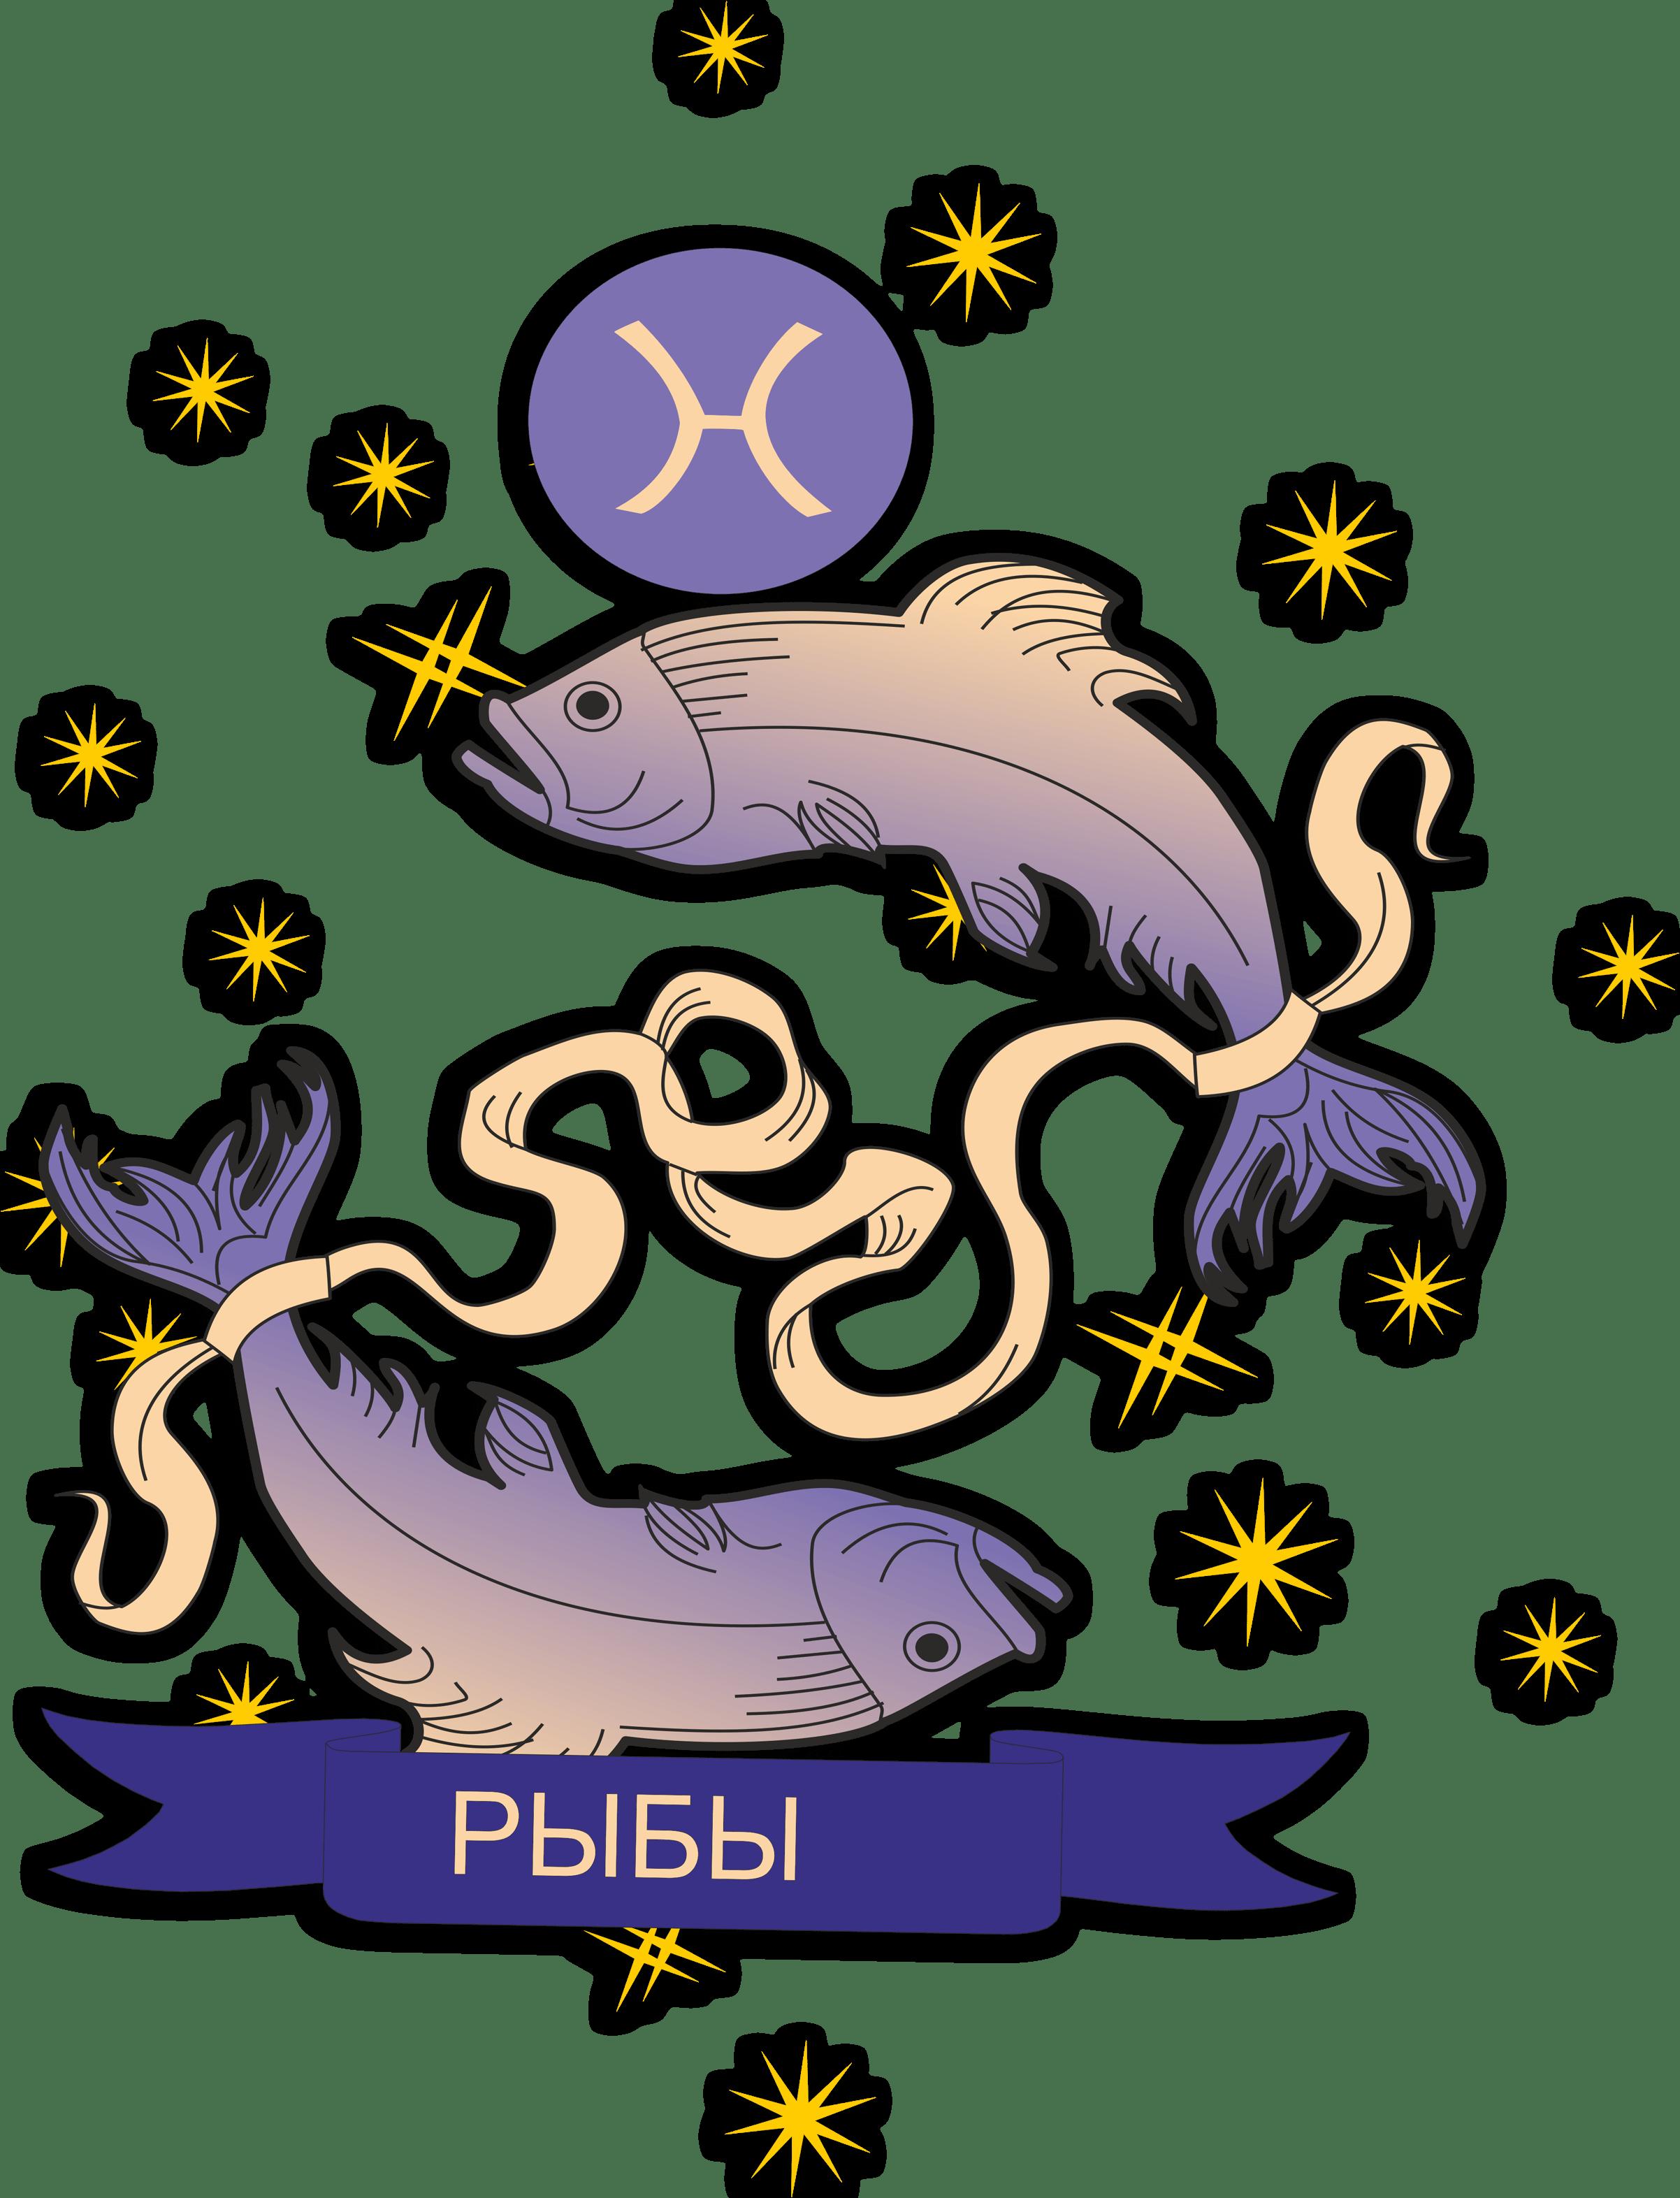 Тату рыбы знак зодиака значение